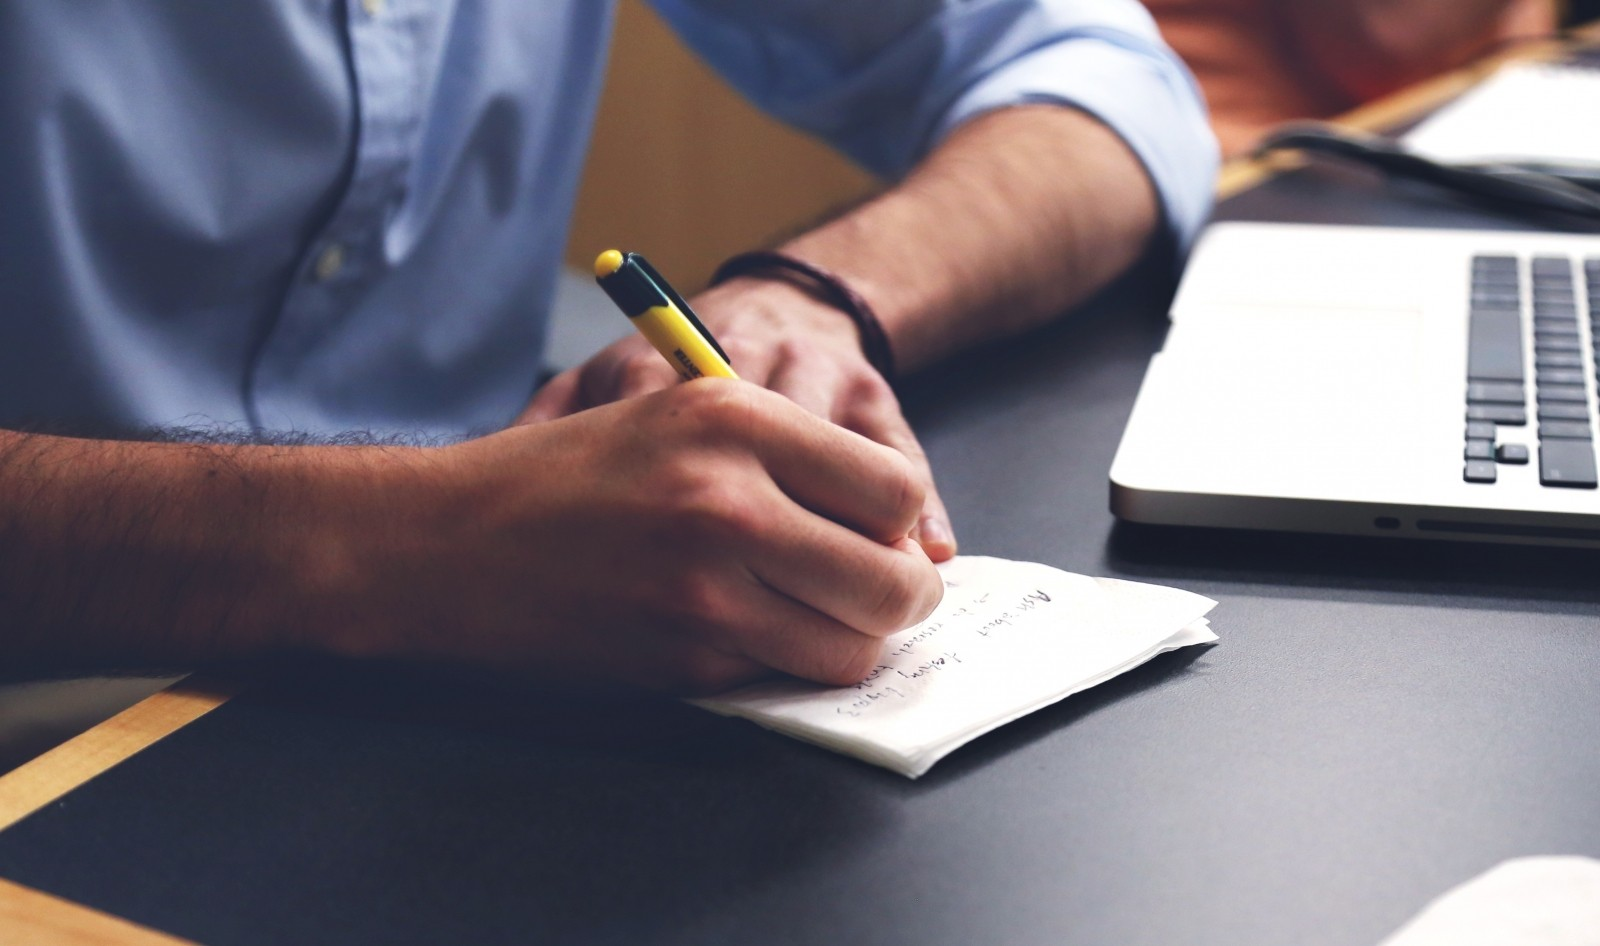 write-plan-business-startup-start-up-notebooks